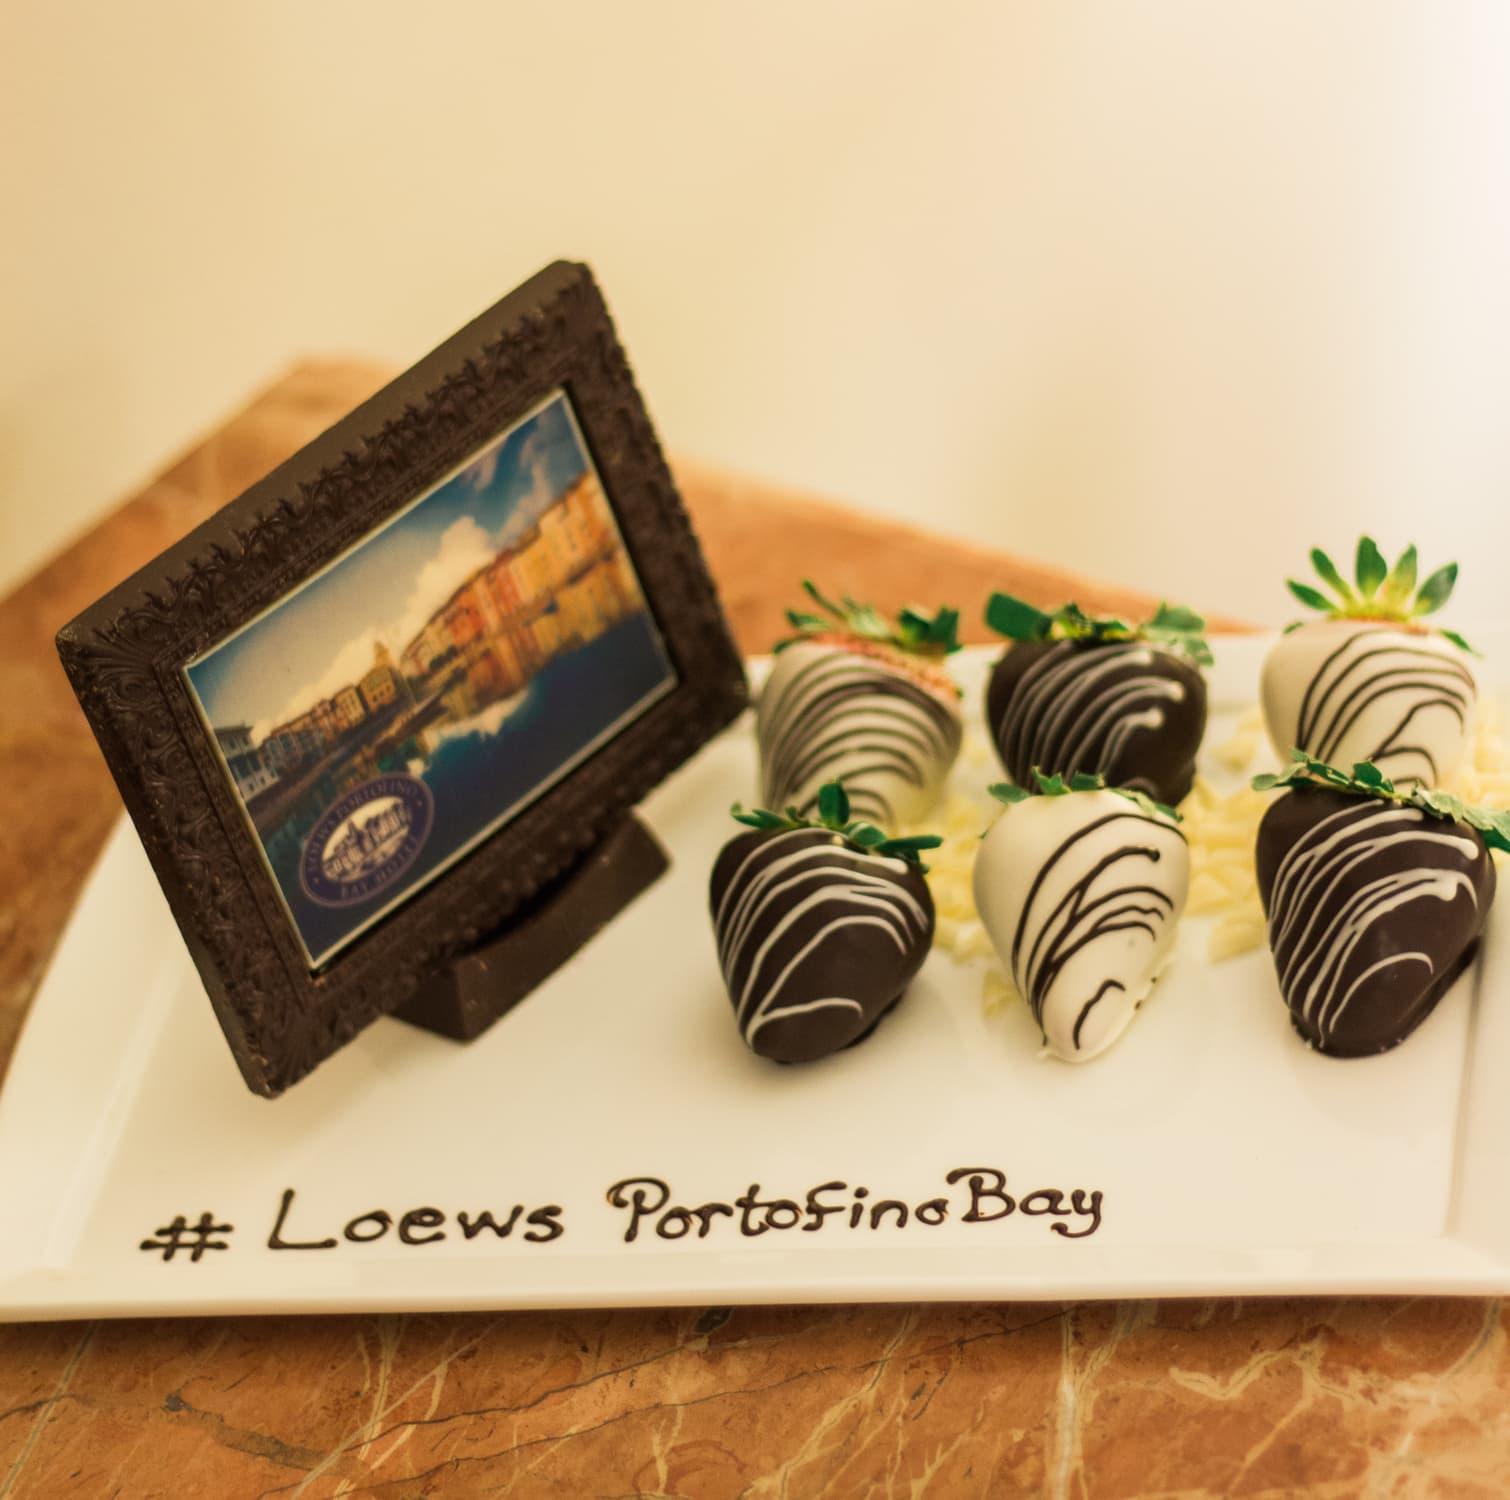 Portofino bay Hotel review orlando florida chocolate strawberries vacation dessert